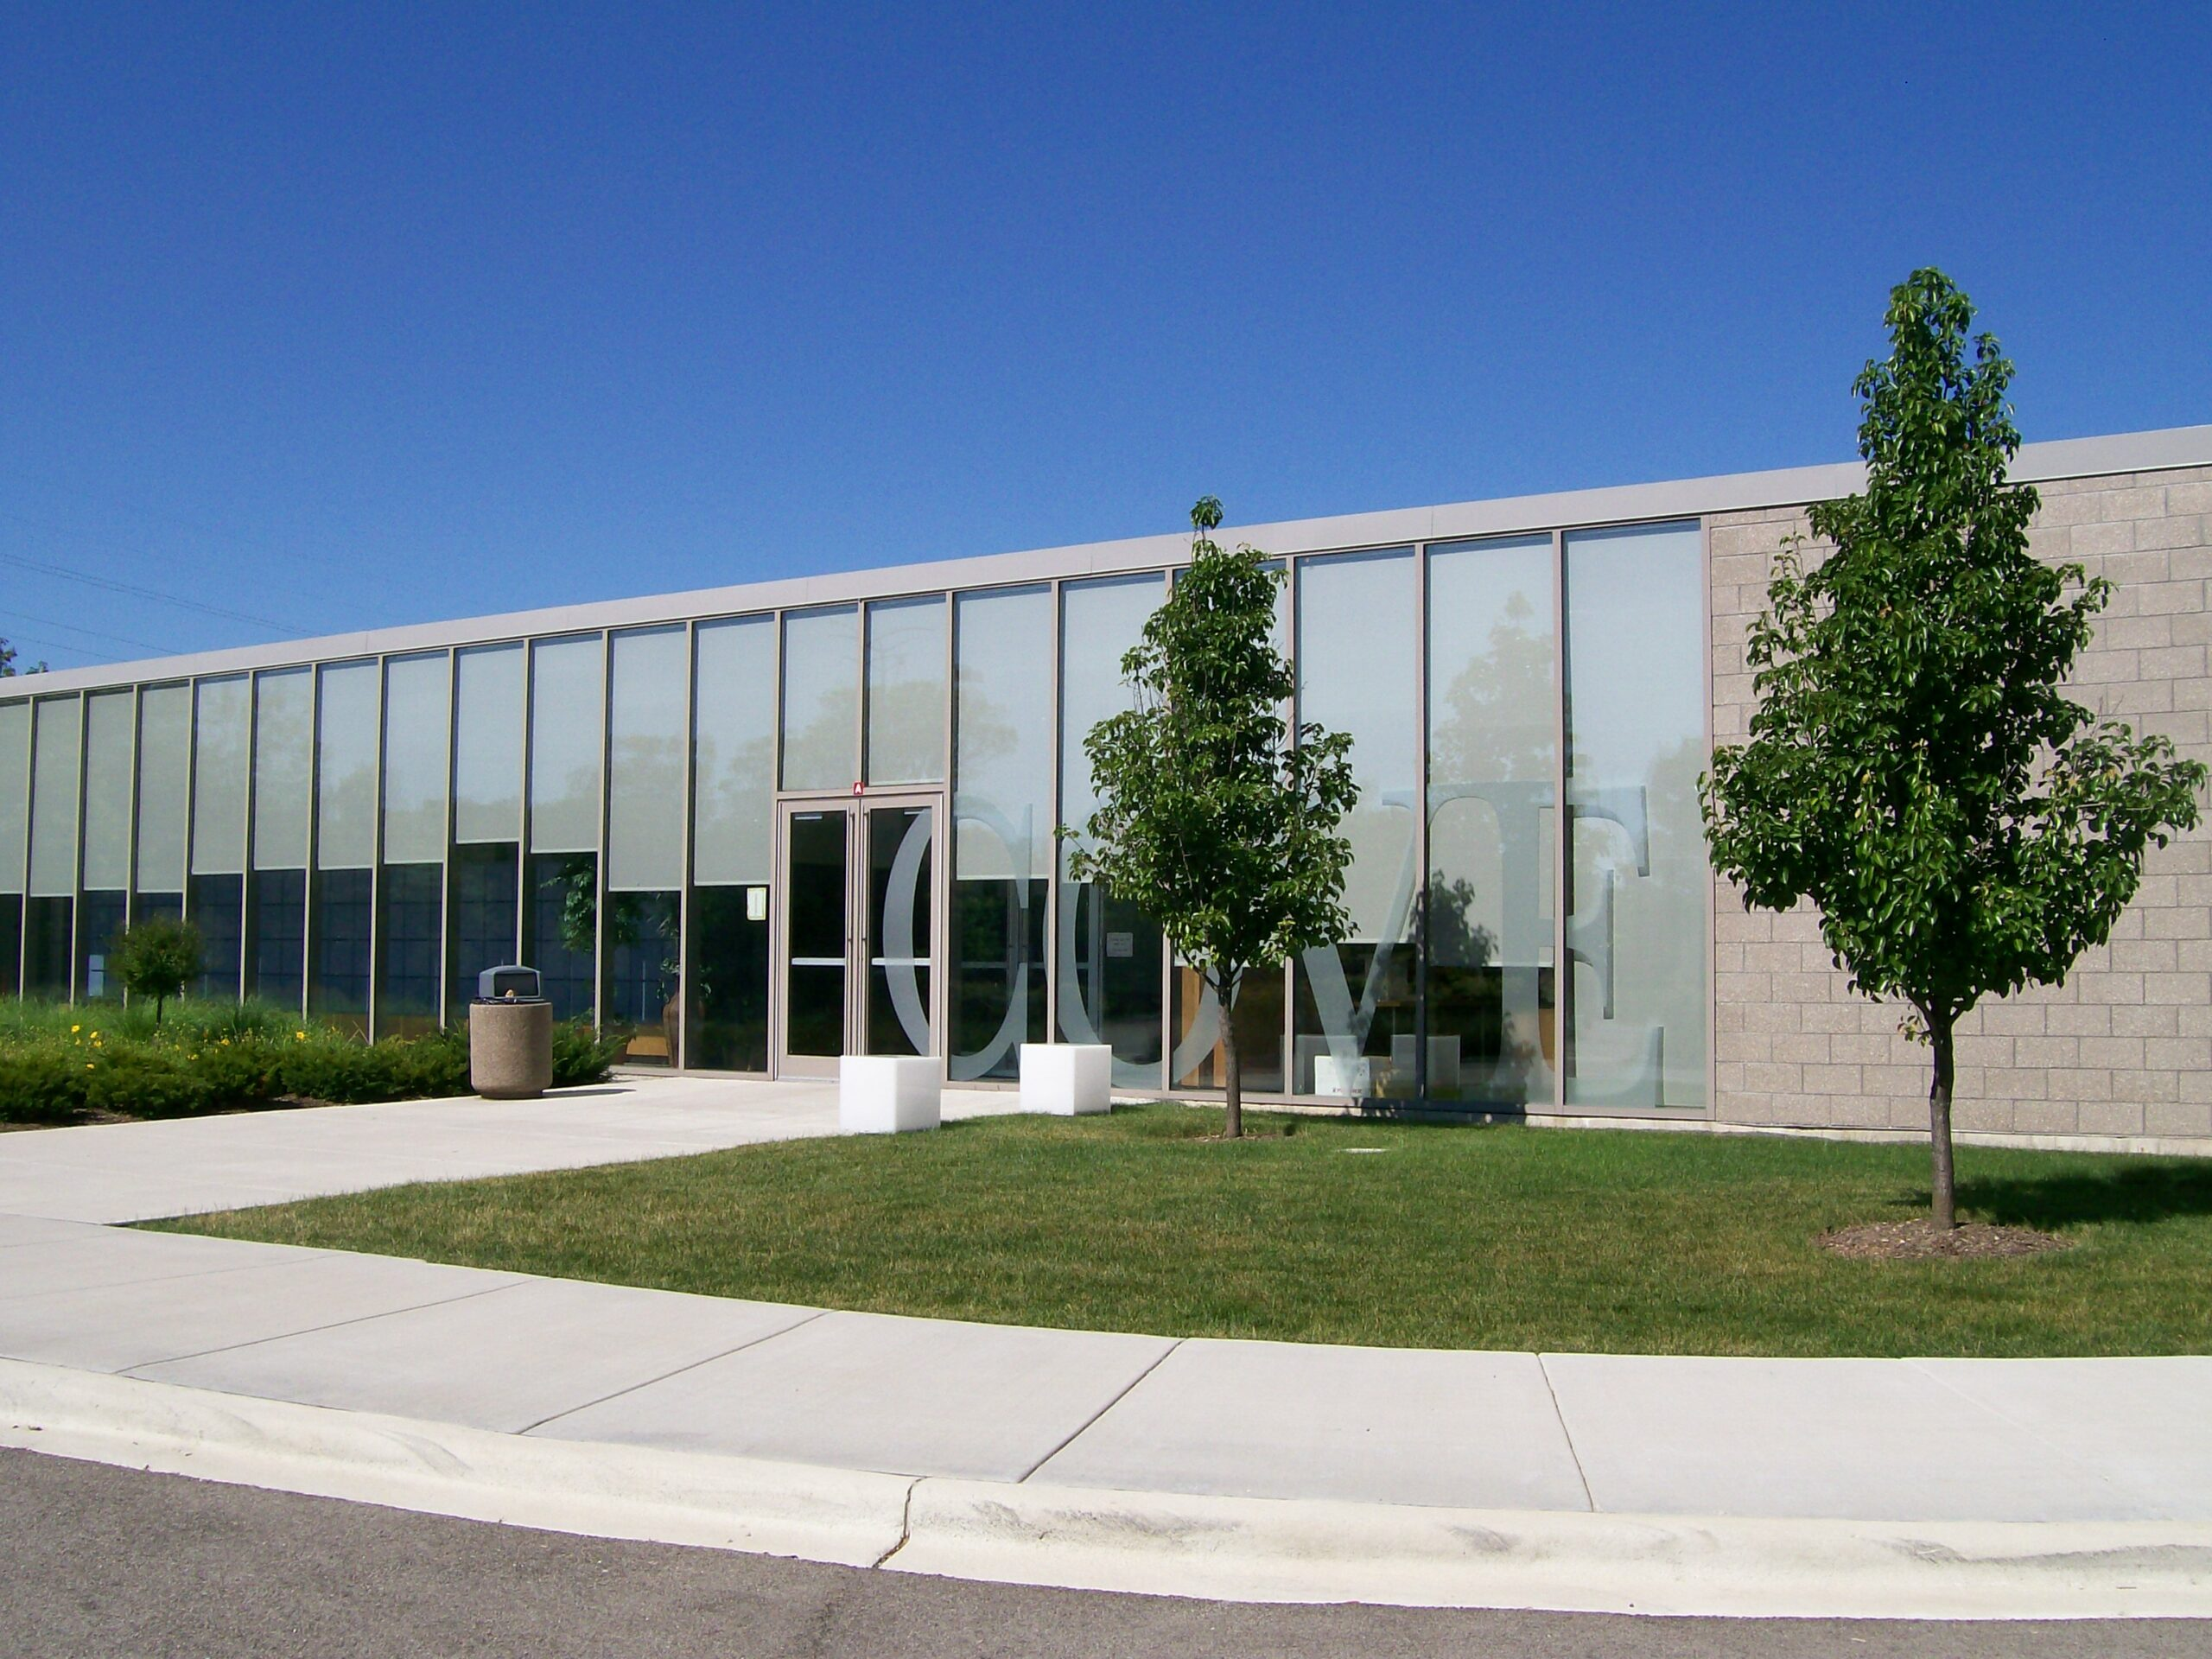 Exterior of The Cove School.